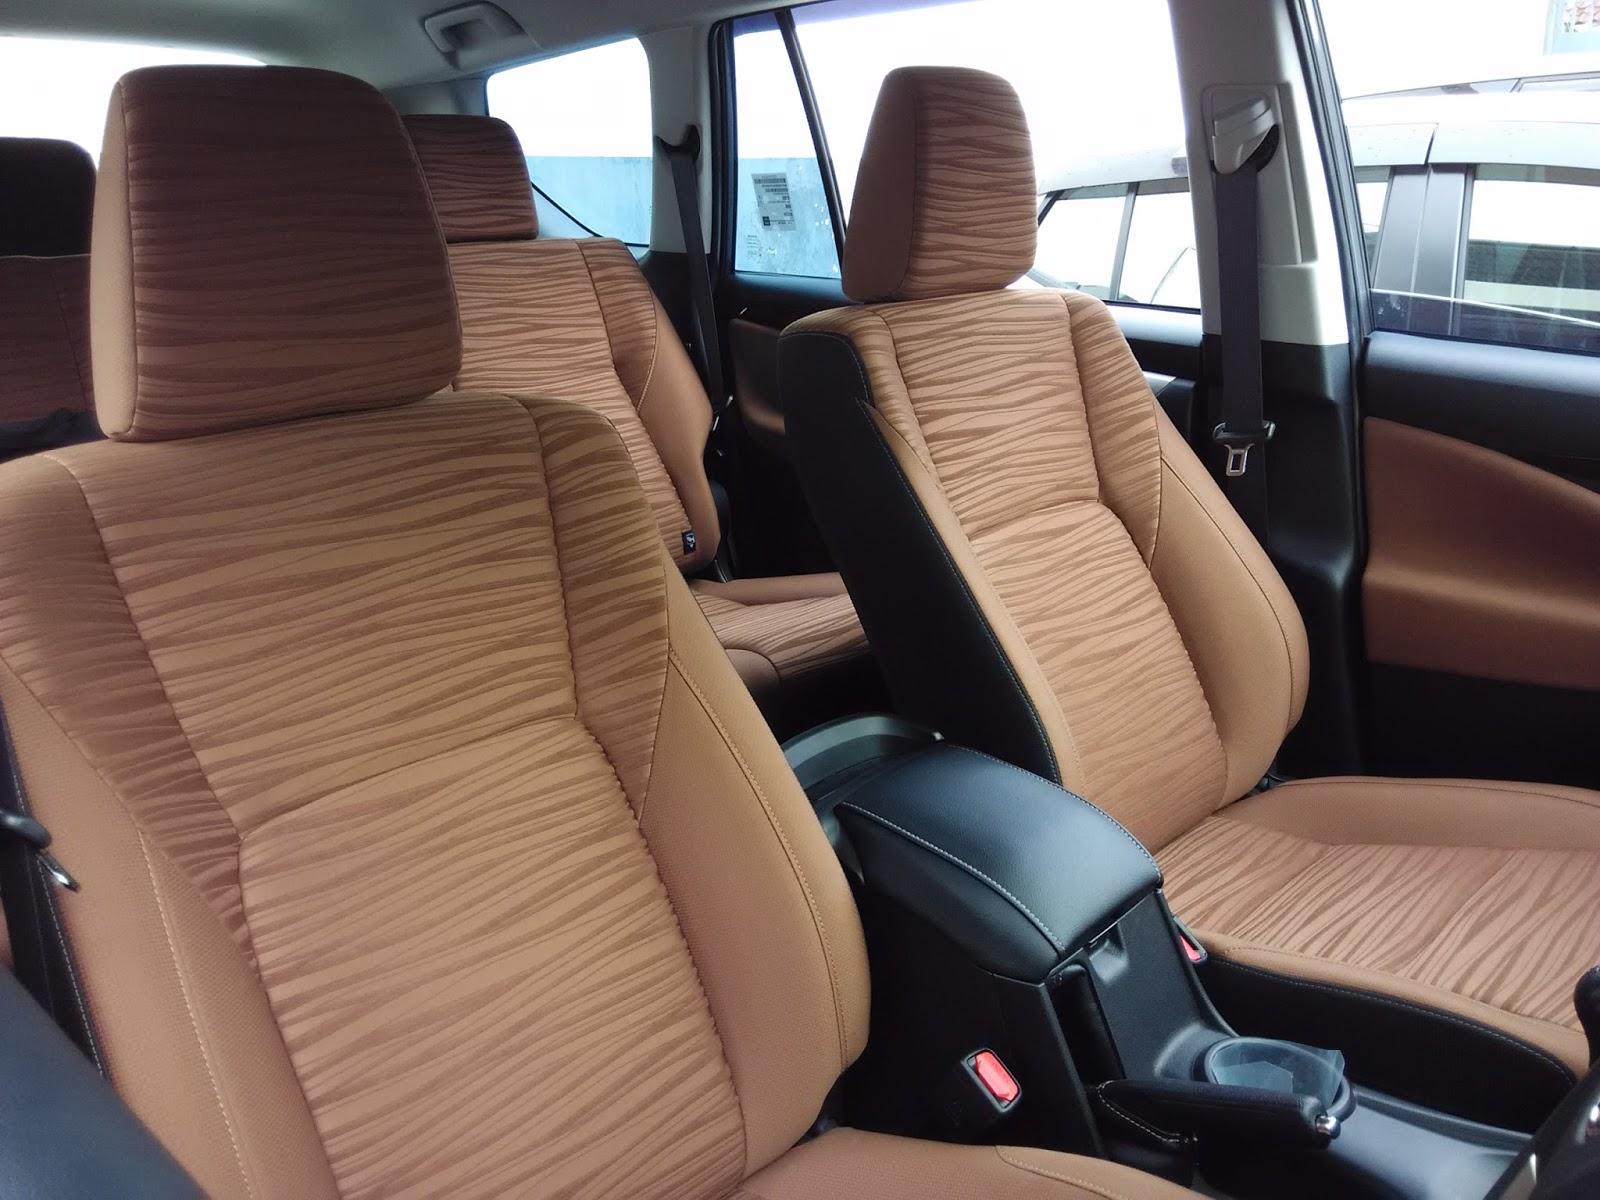 all new kijang innova 2.4 g at diesel harga grand avanza veloz mobil keluarga terbaru toyota 2016